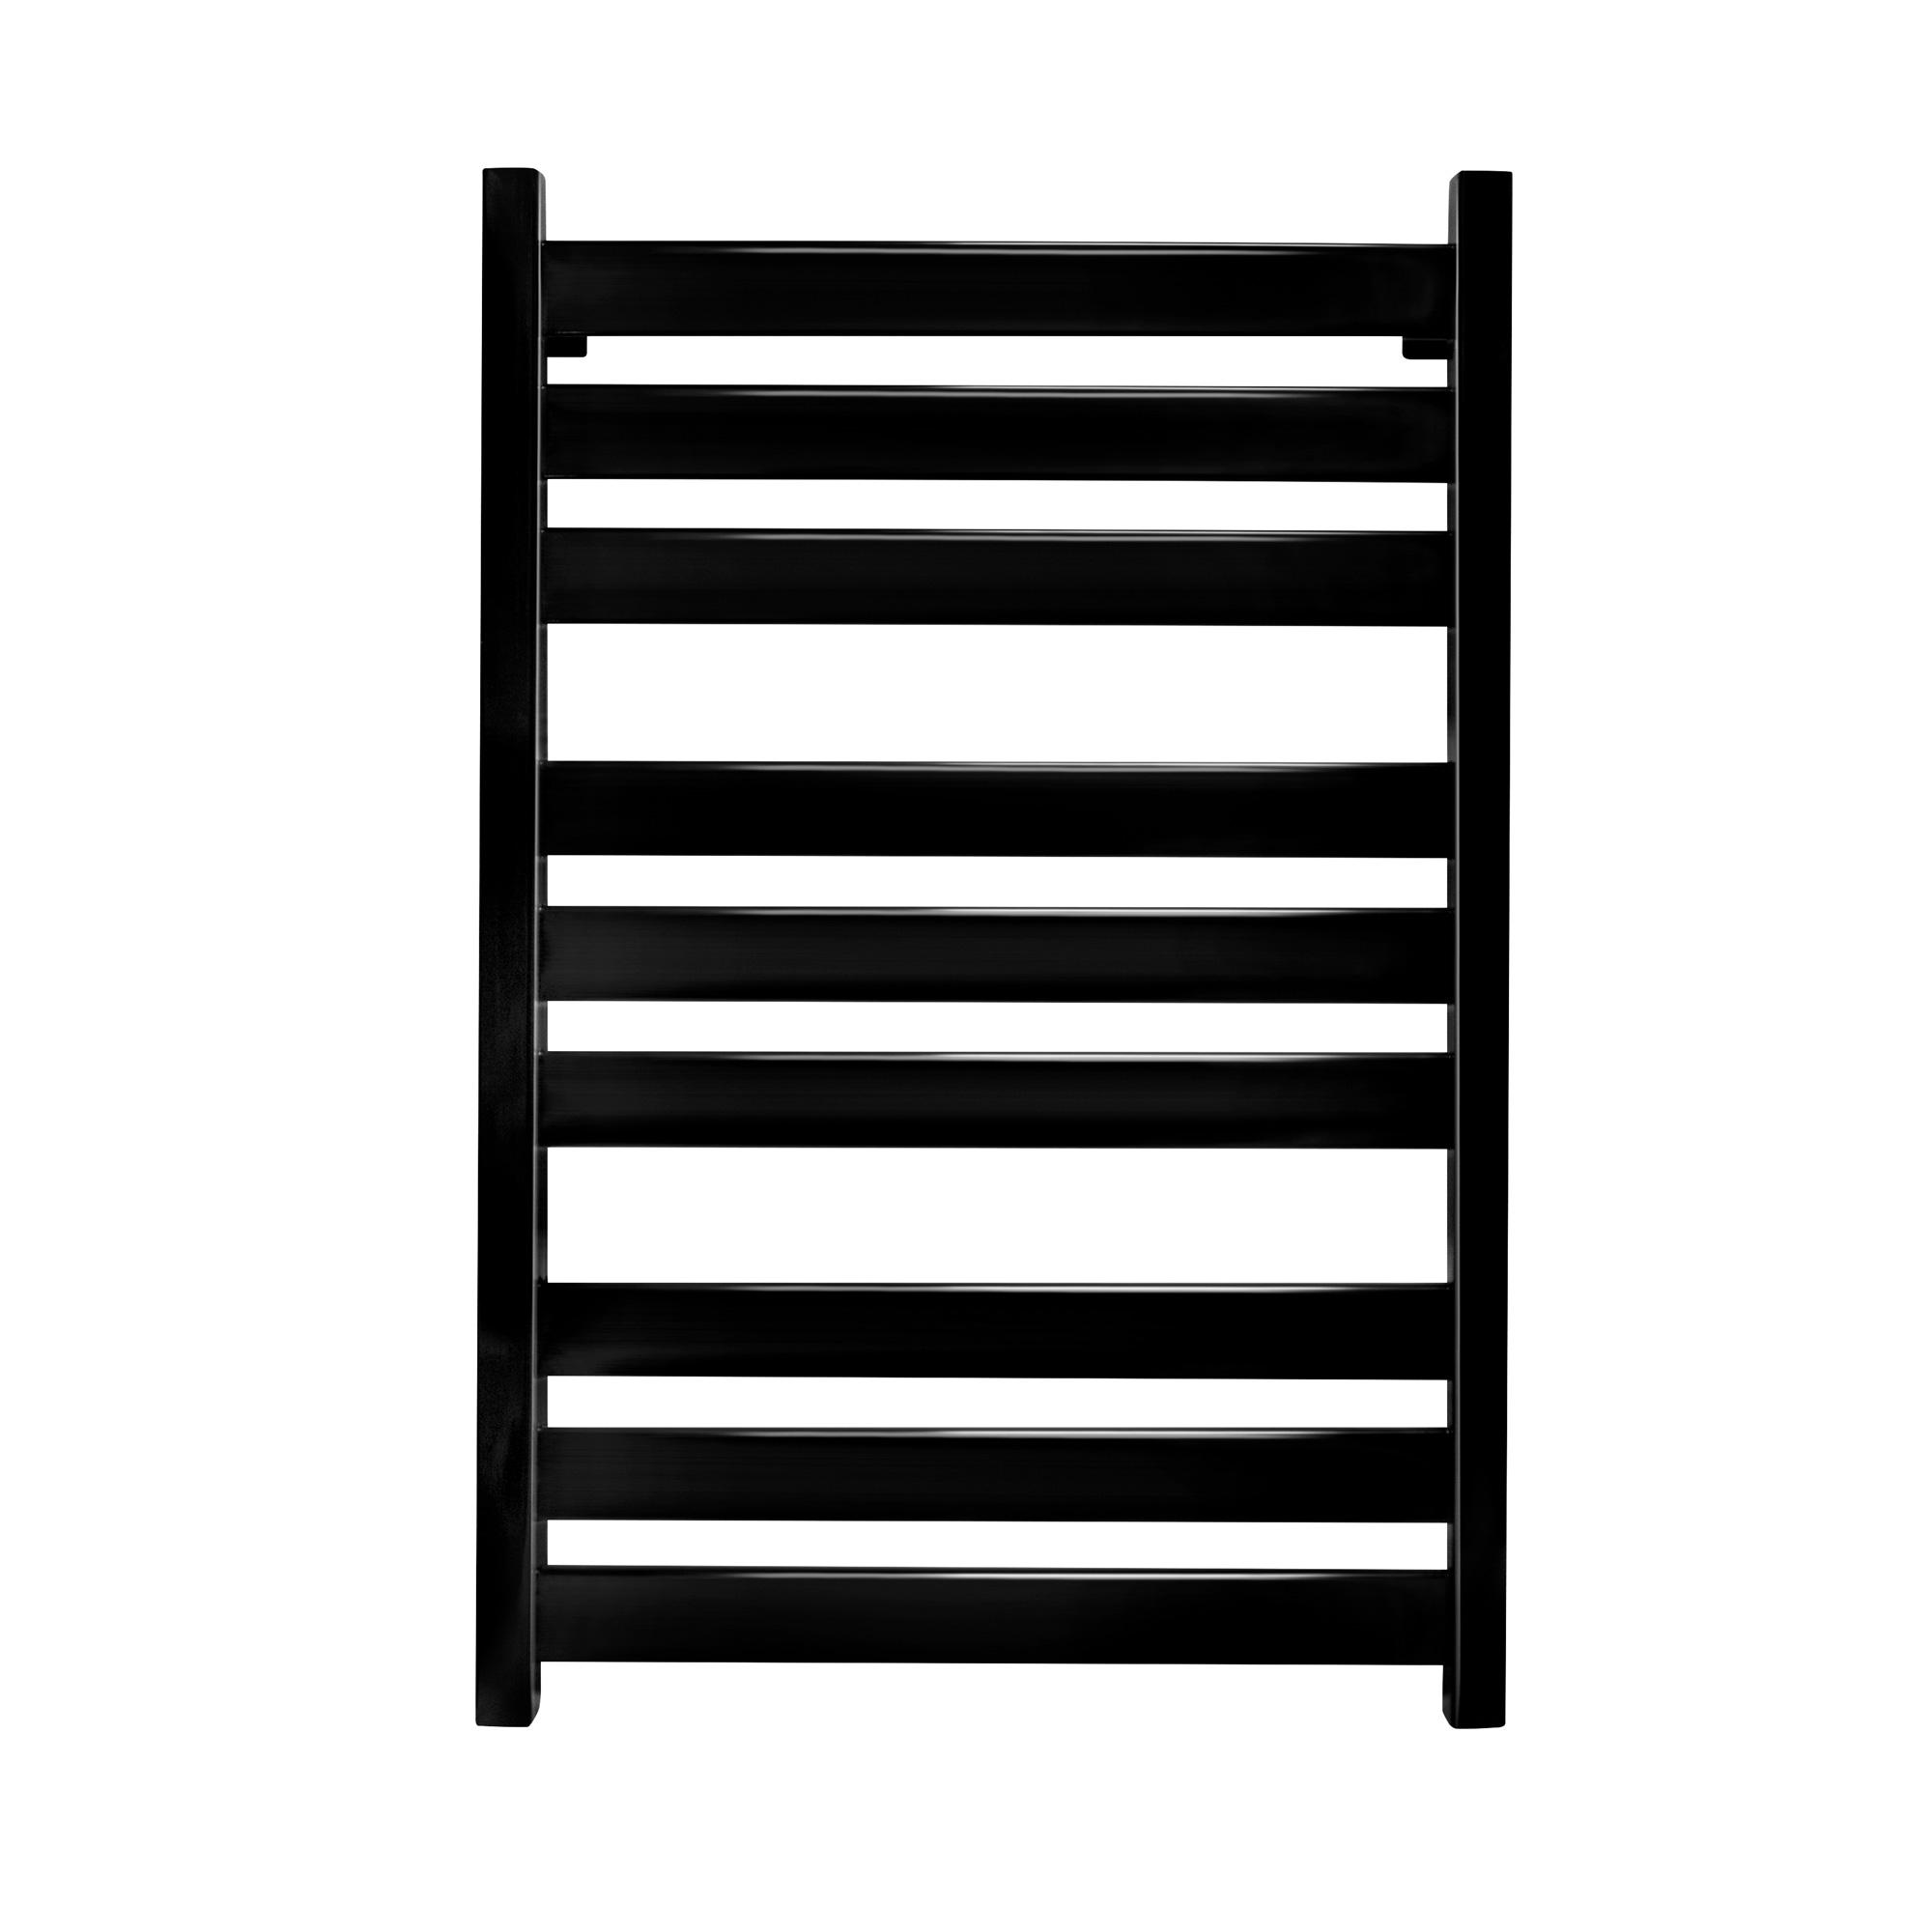 Полотенцесушитель Energy Style 800x500 черный янтарь (RAL 9005)